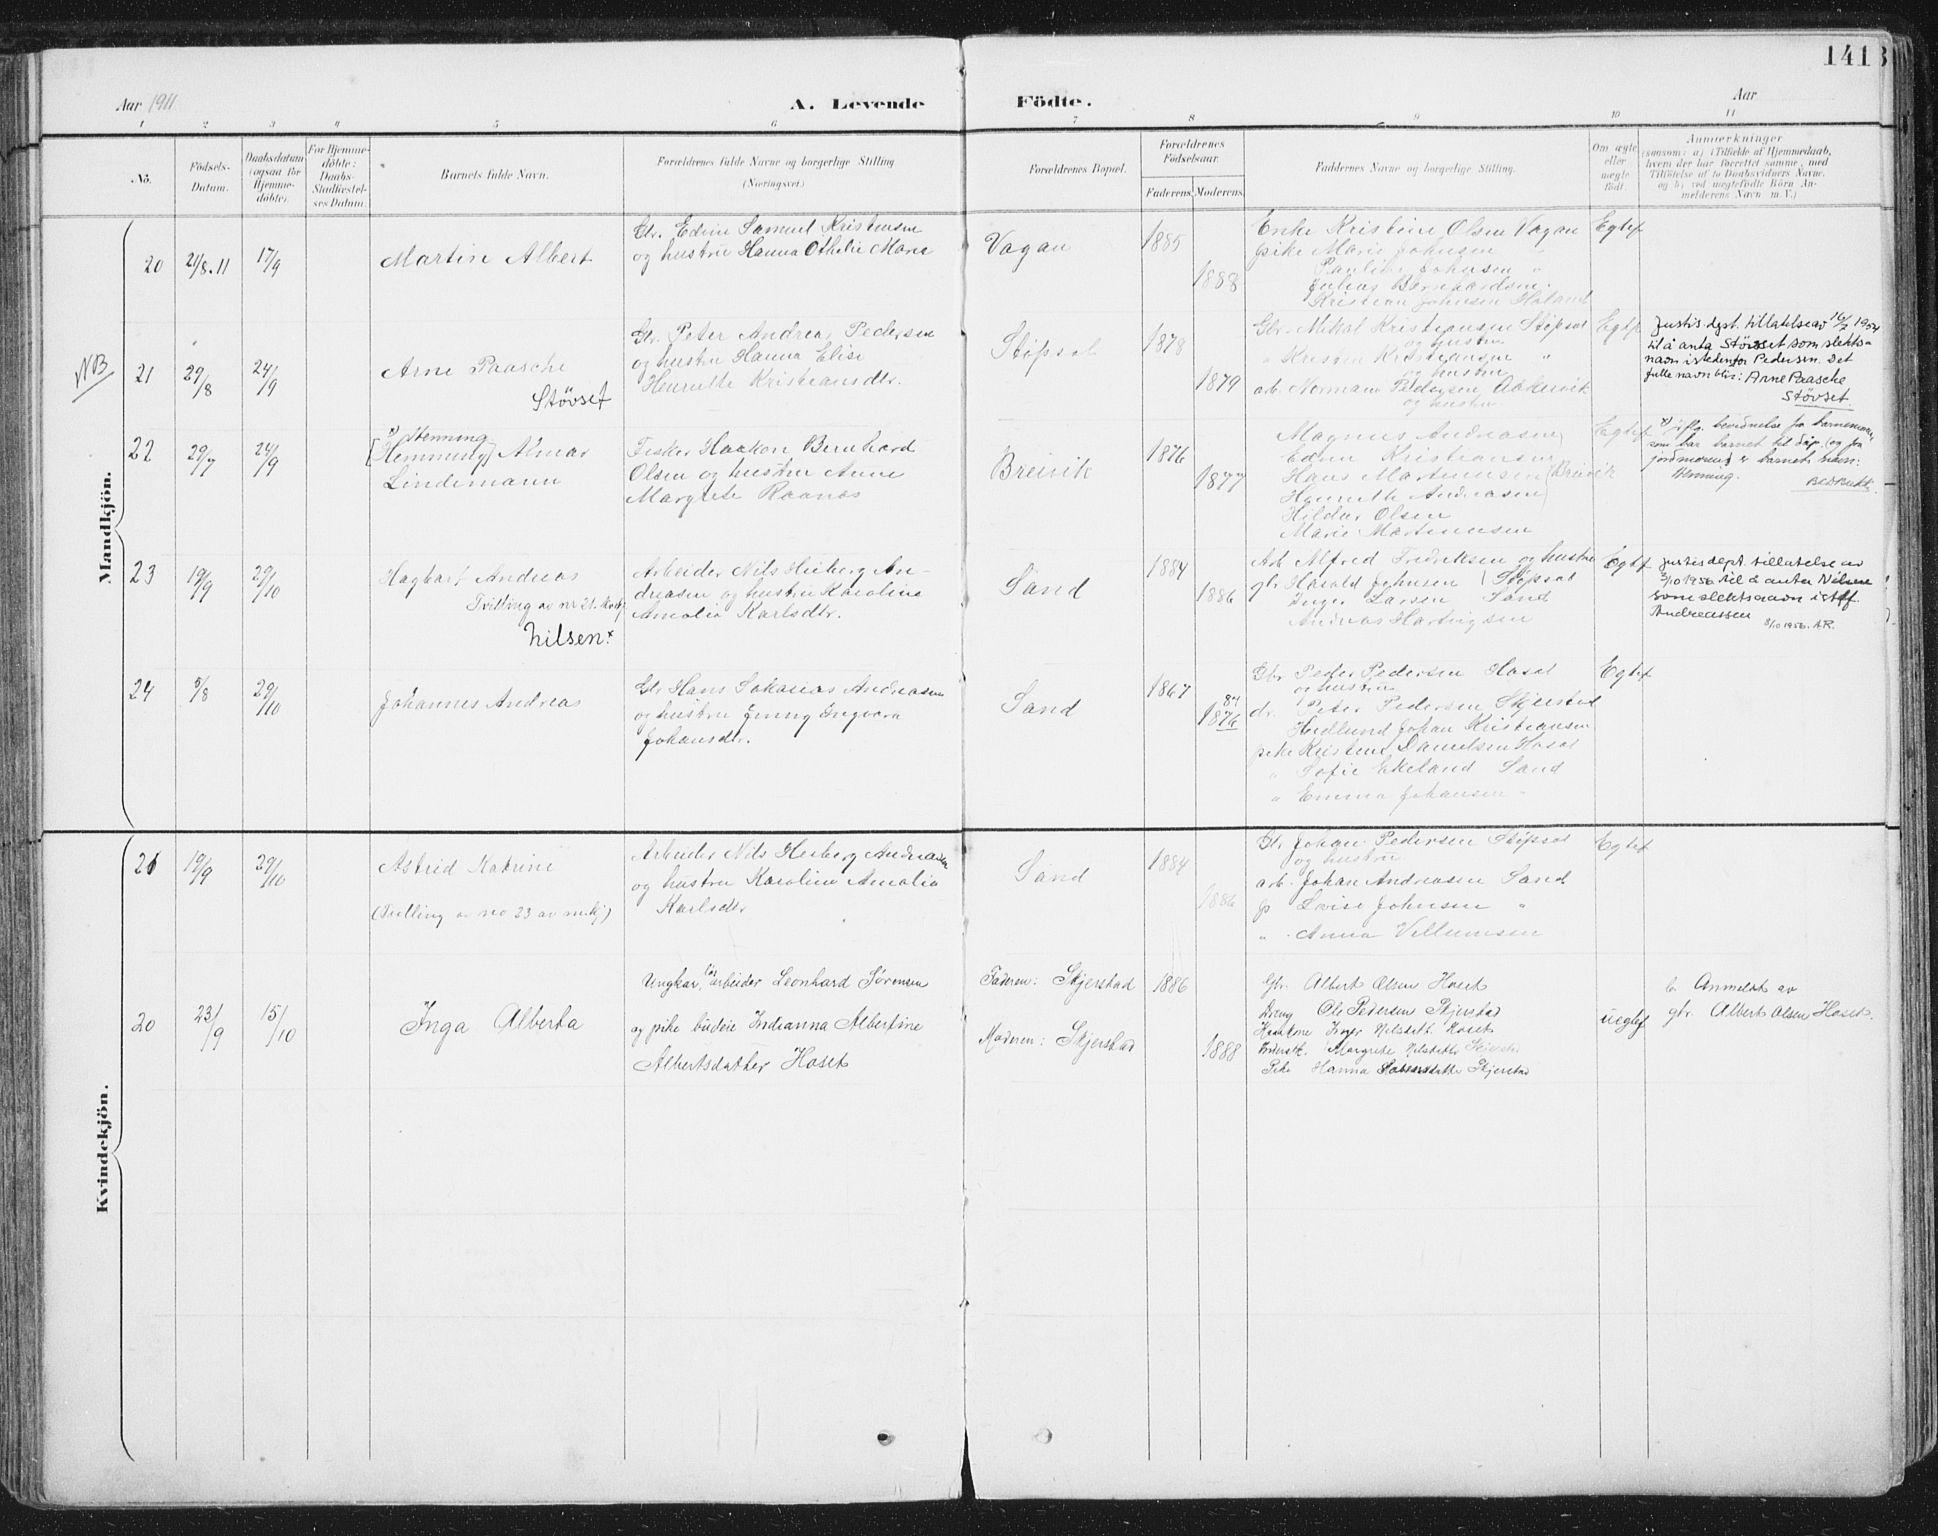 SAT, Ministerialprotokoller, klokkerbøker og fødselsregistre - Nordland, 852/L0741: Ministerialbok nr. 852A11, 1894-1917, s. 141